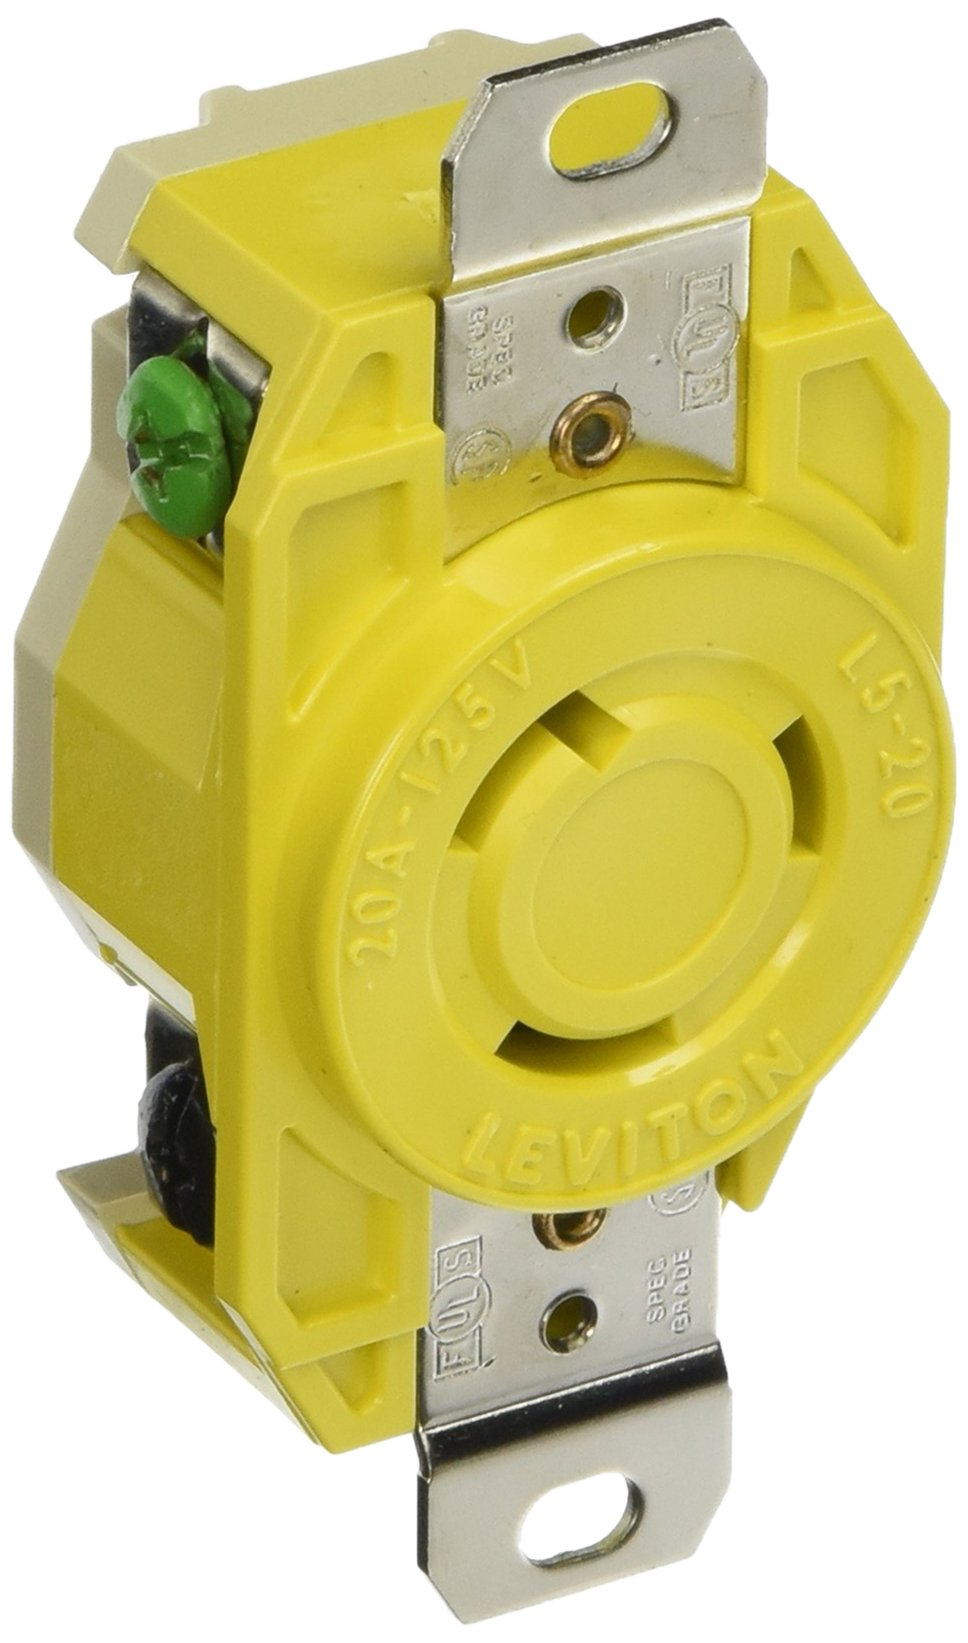 Leviton 23CM-10 20 Amp, 125 Volt, Flush Mounting Locking Receptacle, Industrial Grade, Grounding, Corrosion Resistant, Yellow